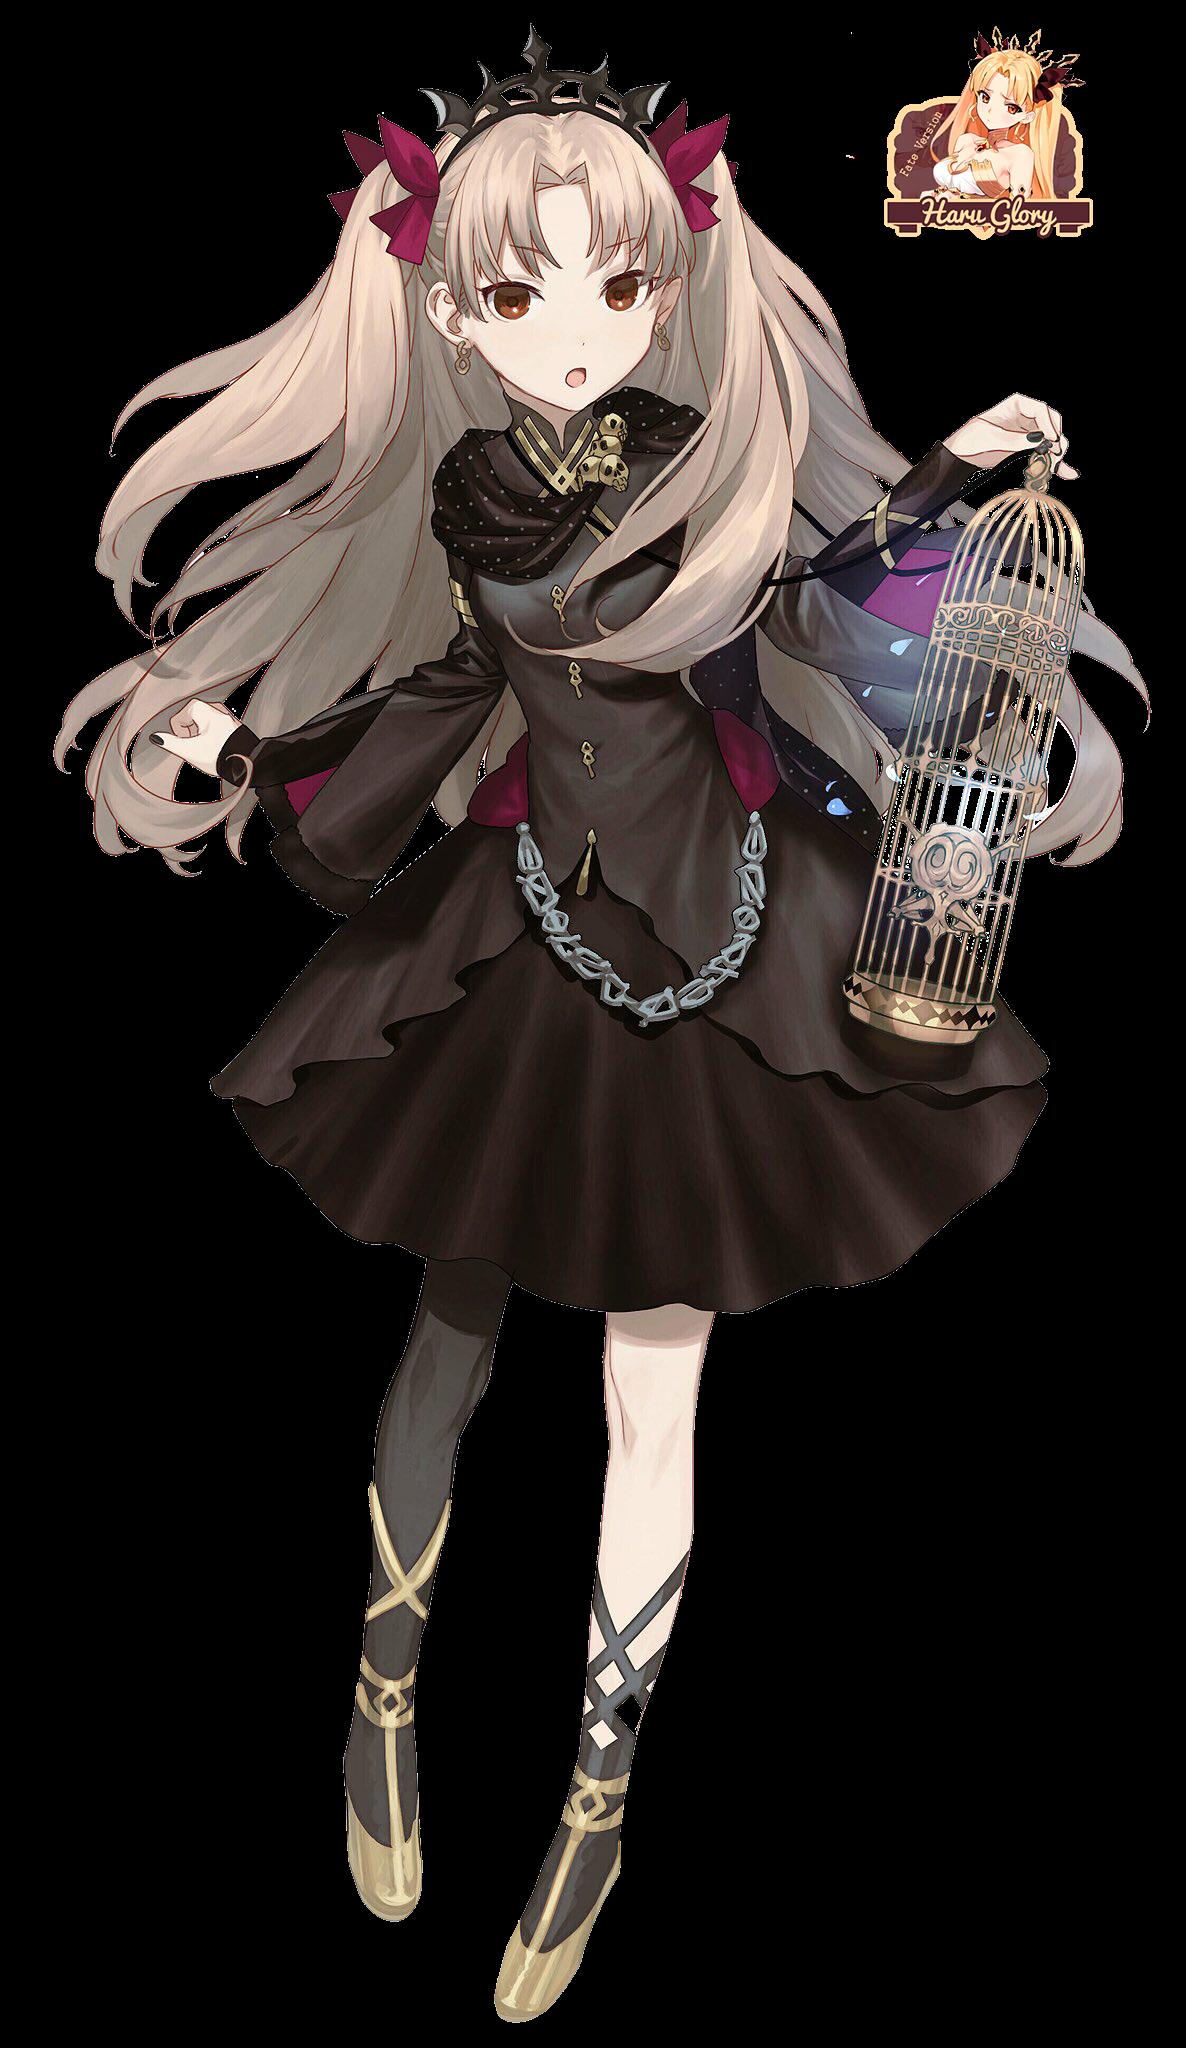 Tohsaka Rin 78 (ereshkigal)